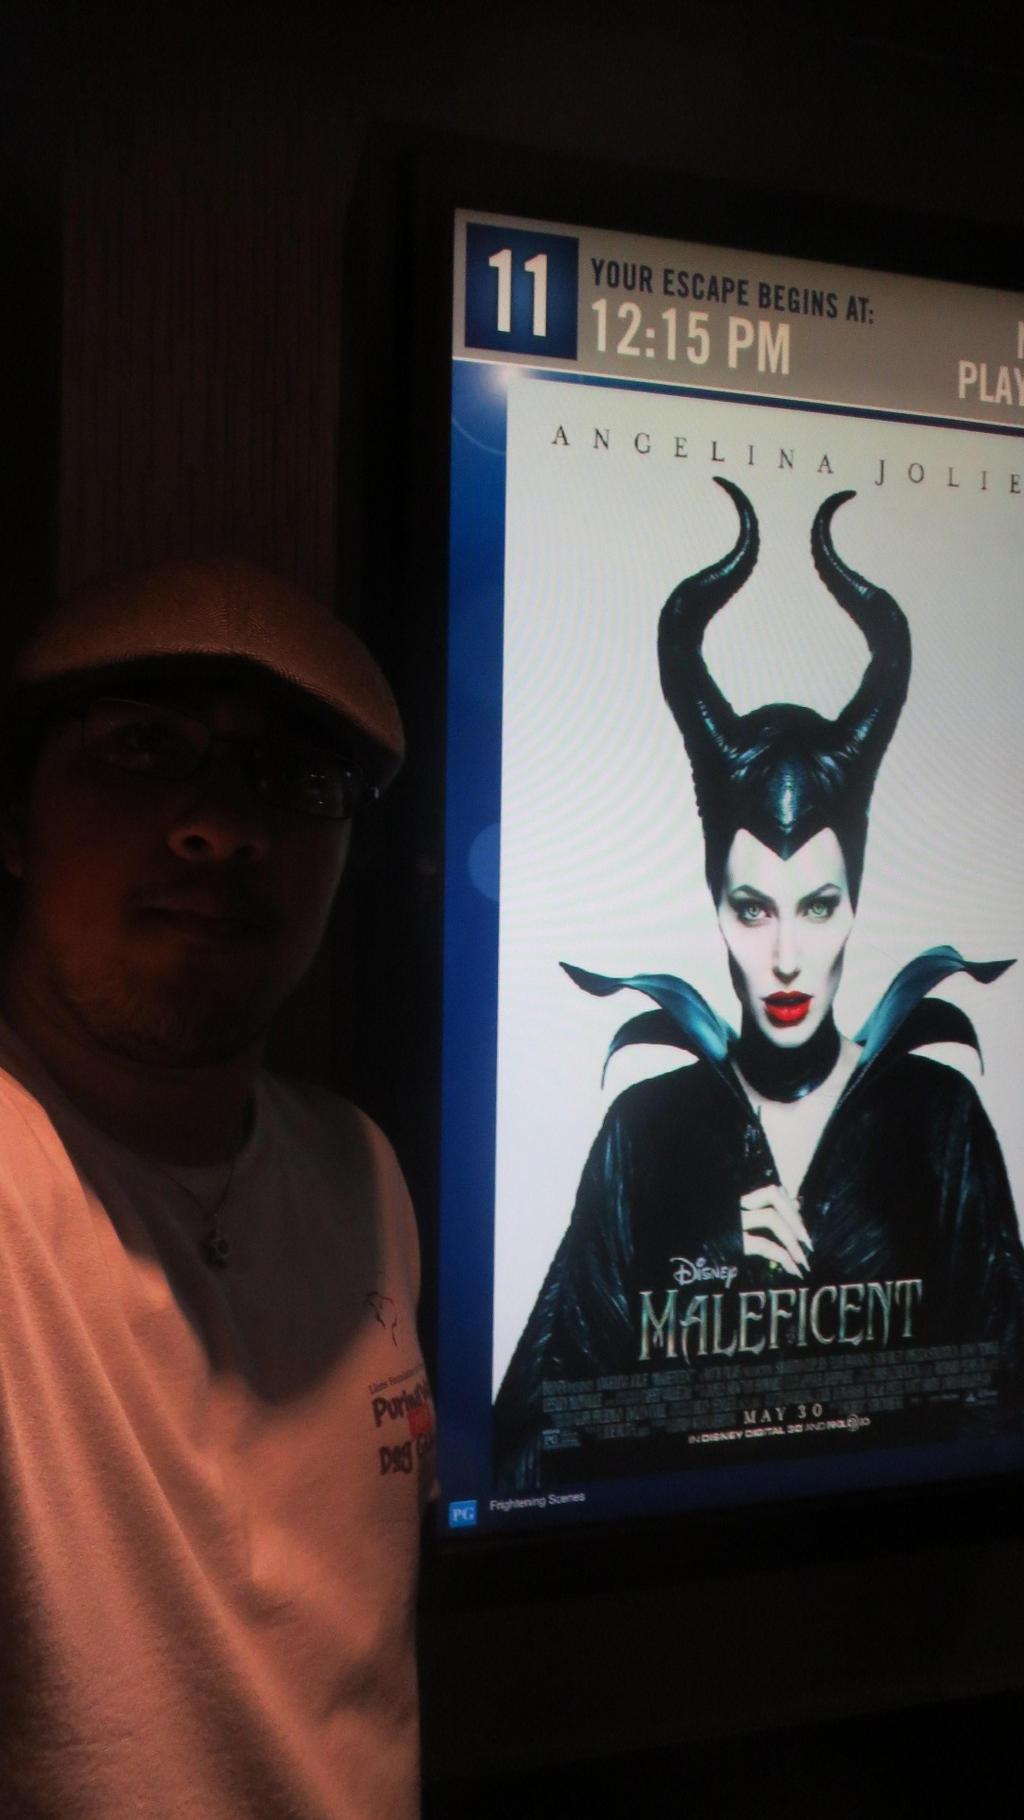 maleficent movie poster by codetski101 on deviantart